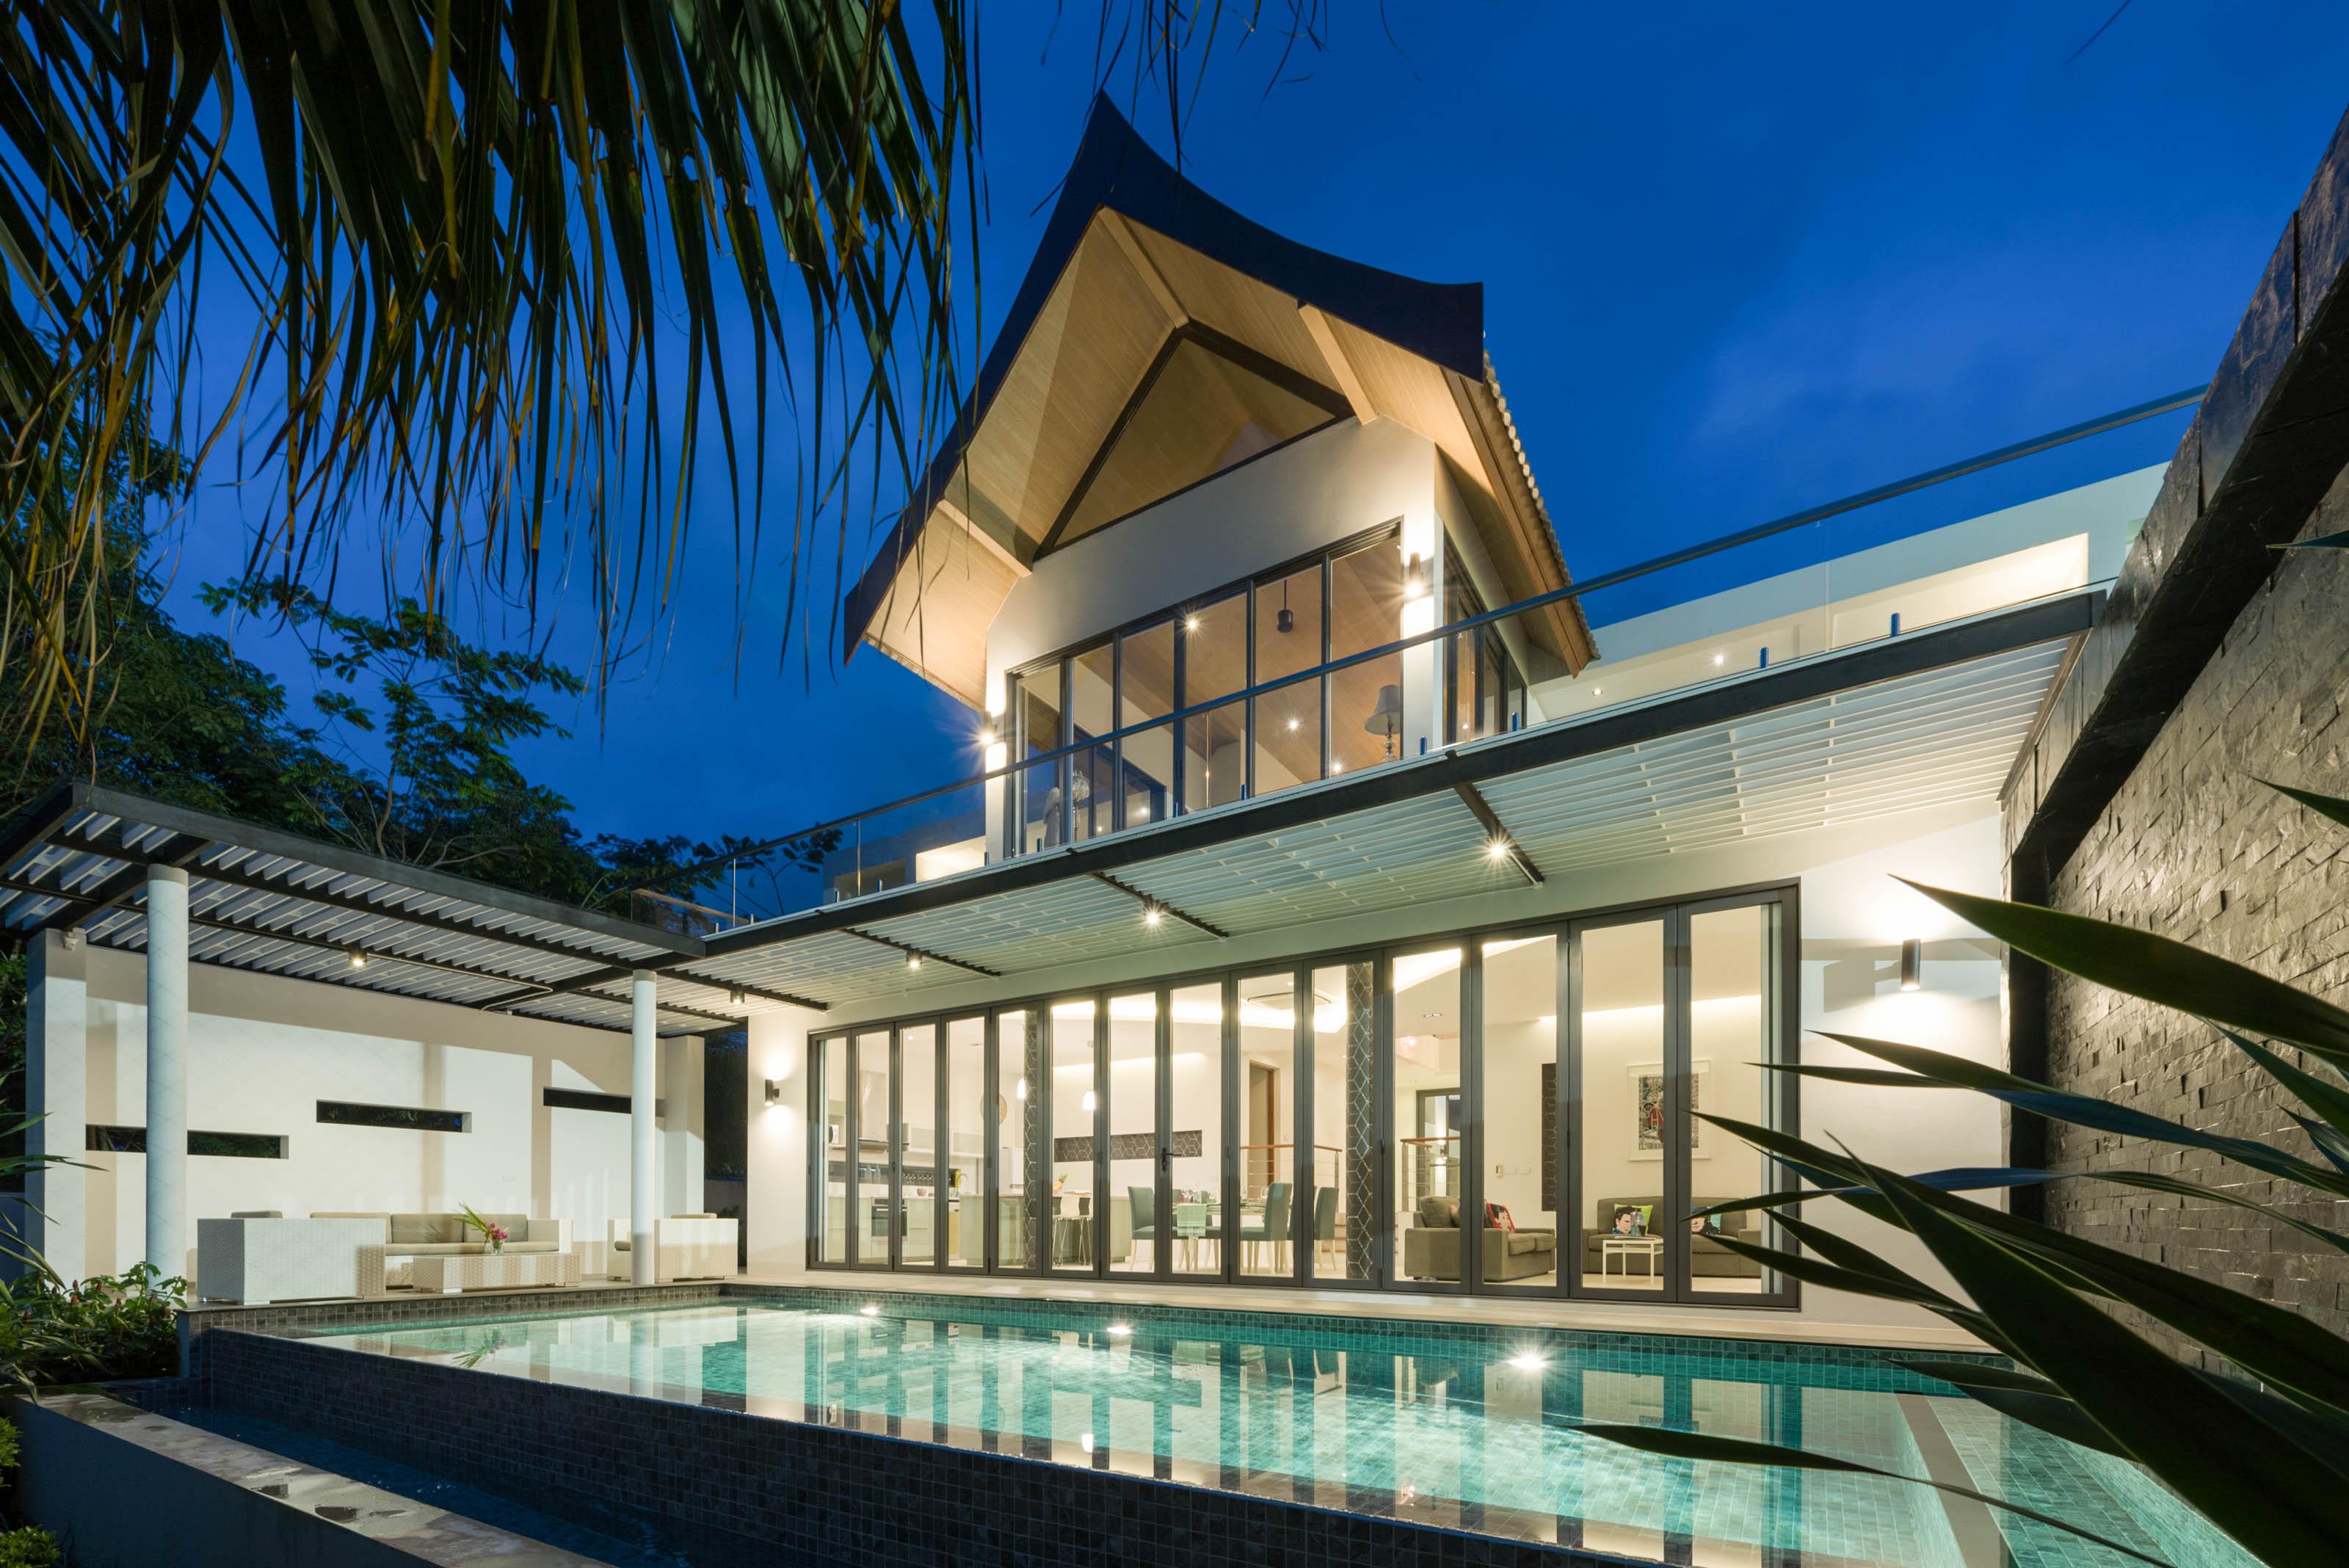 8 Bedrooms Pool Luxury Villas for Holiday rental